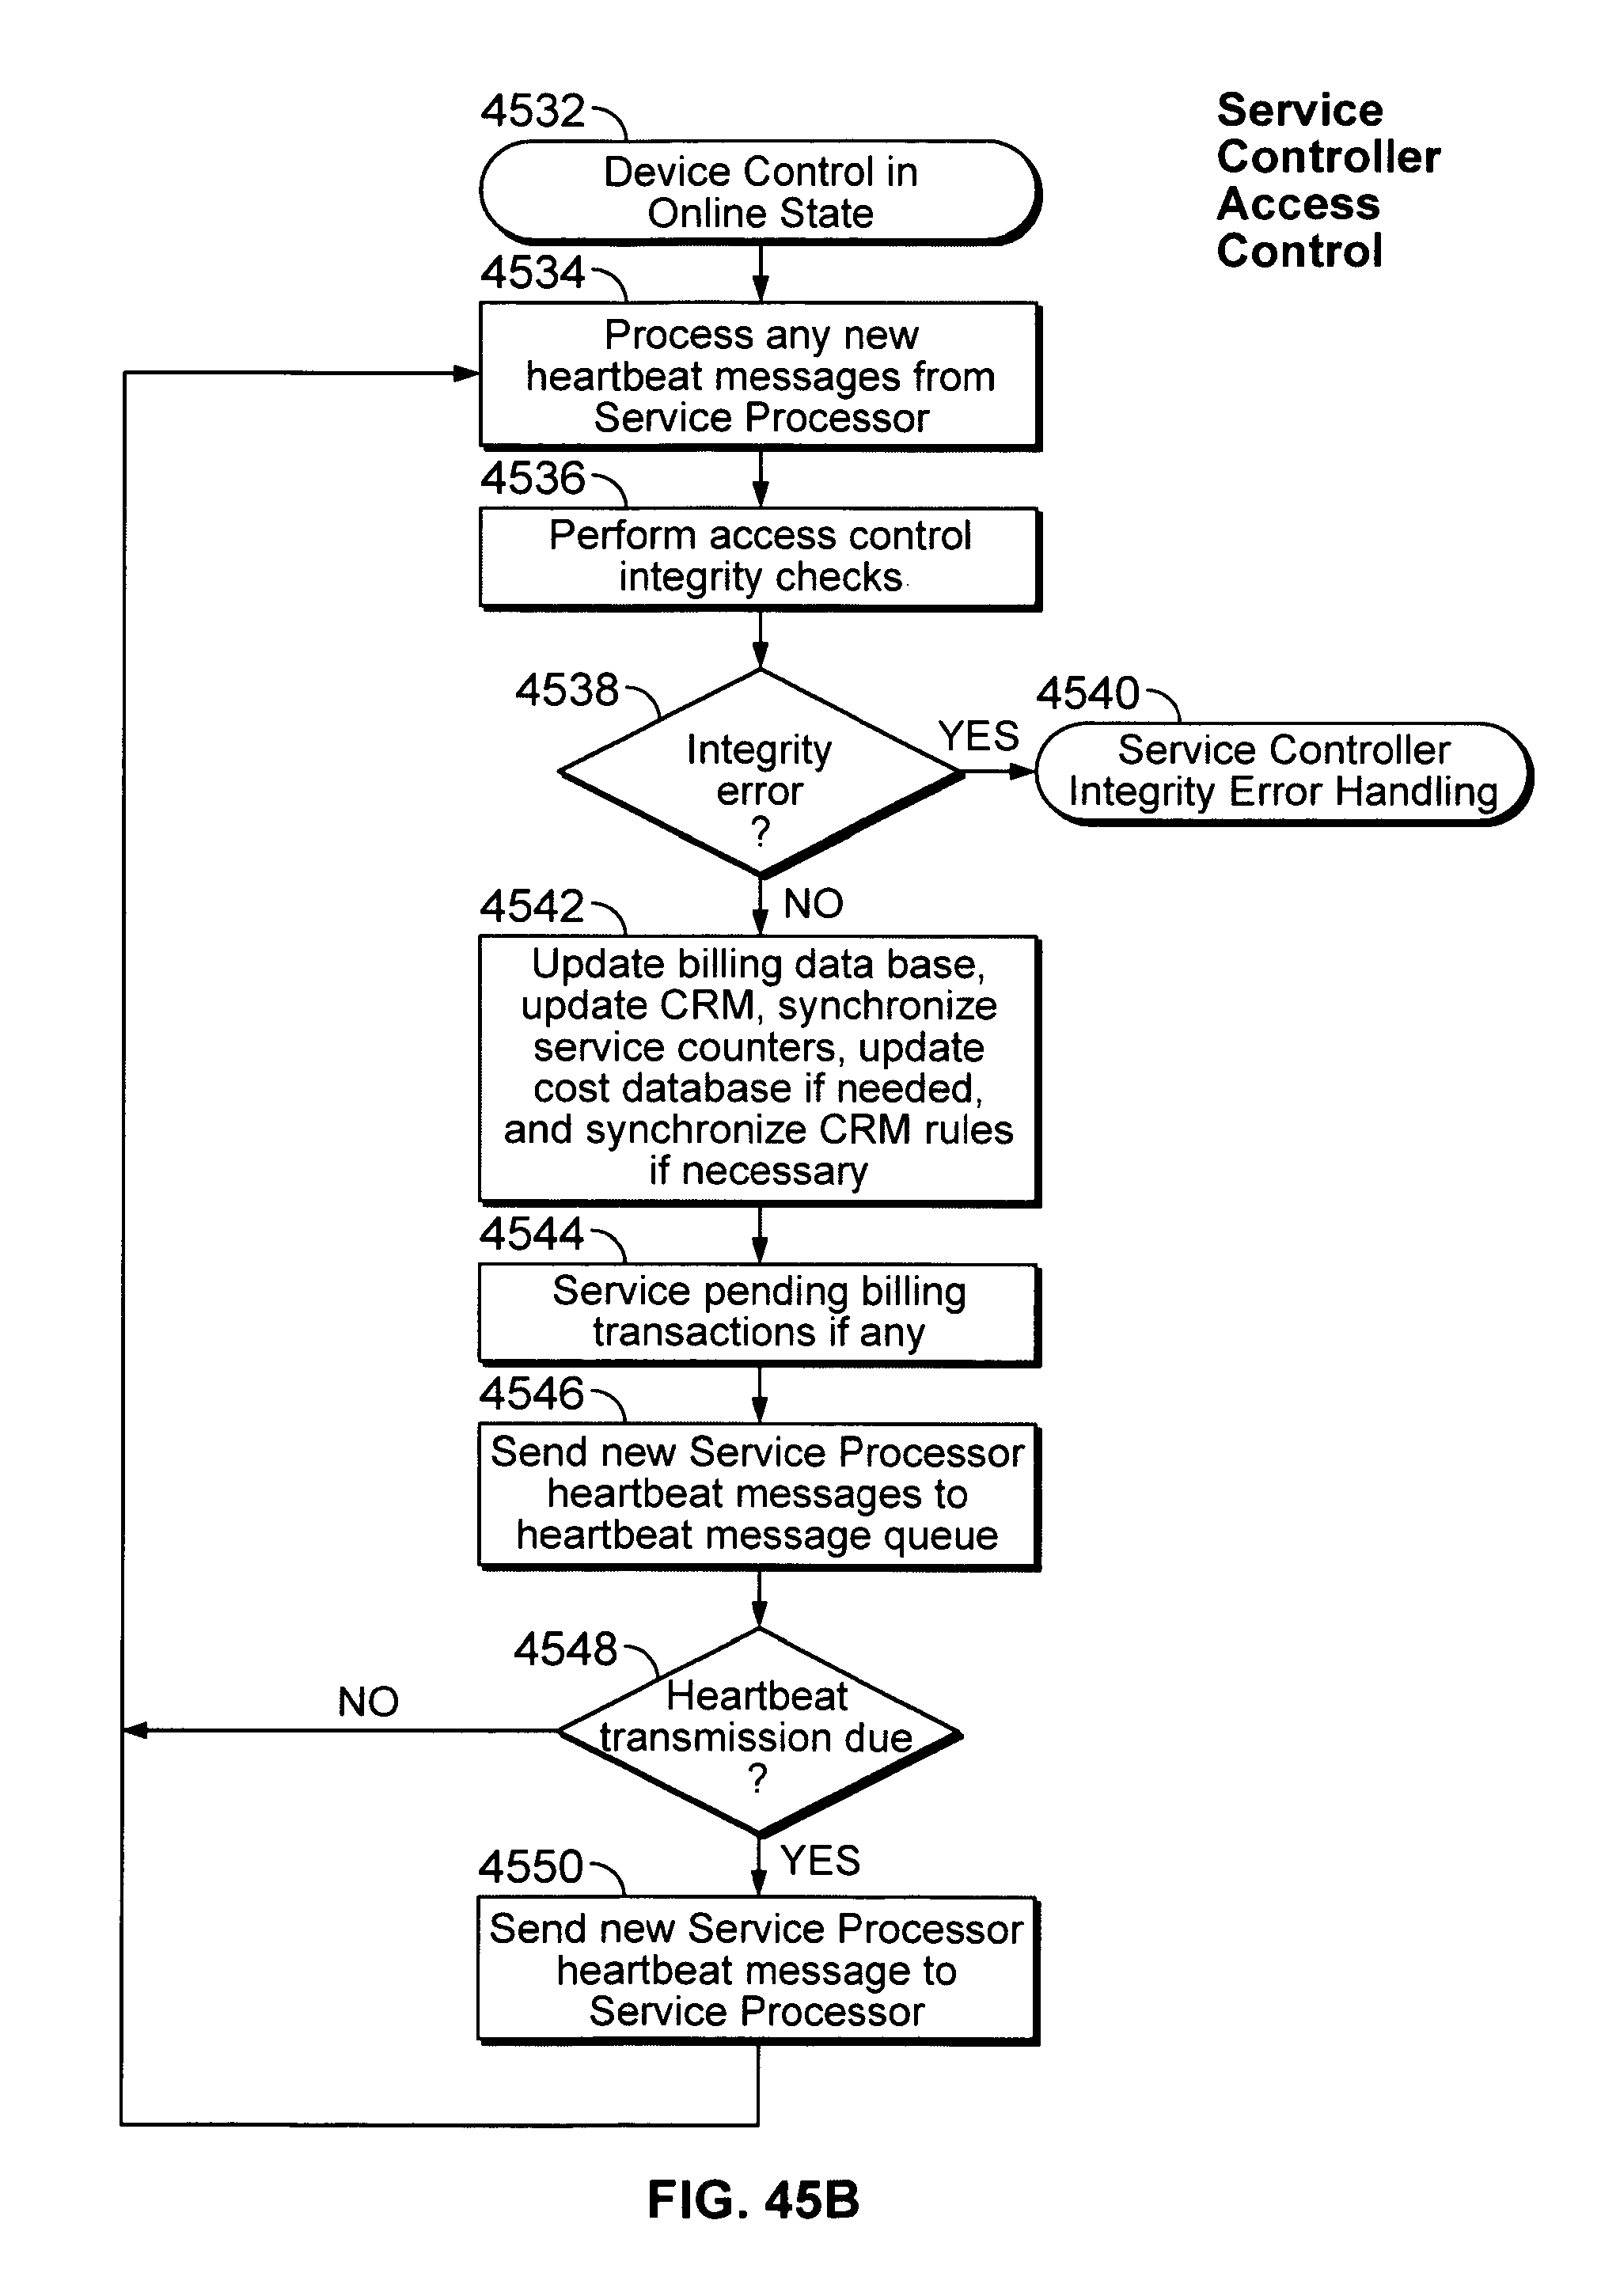 Patent US 9,014,026 B2